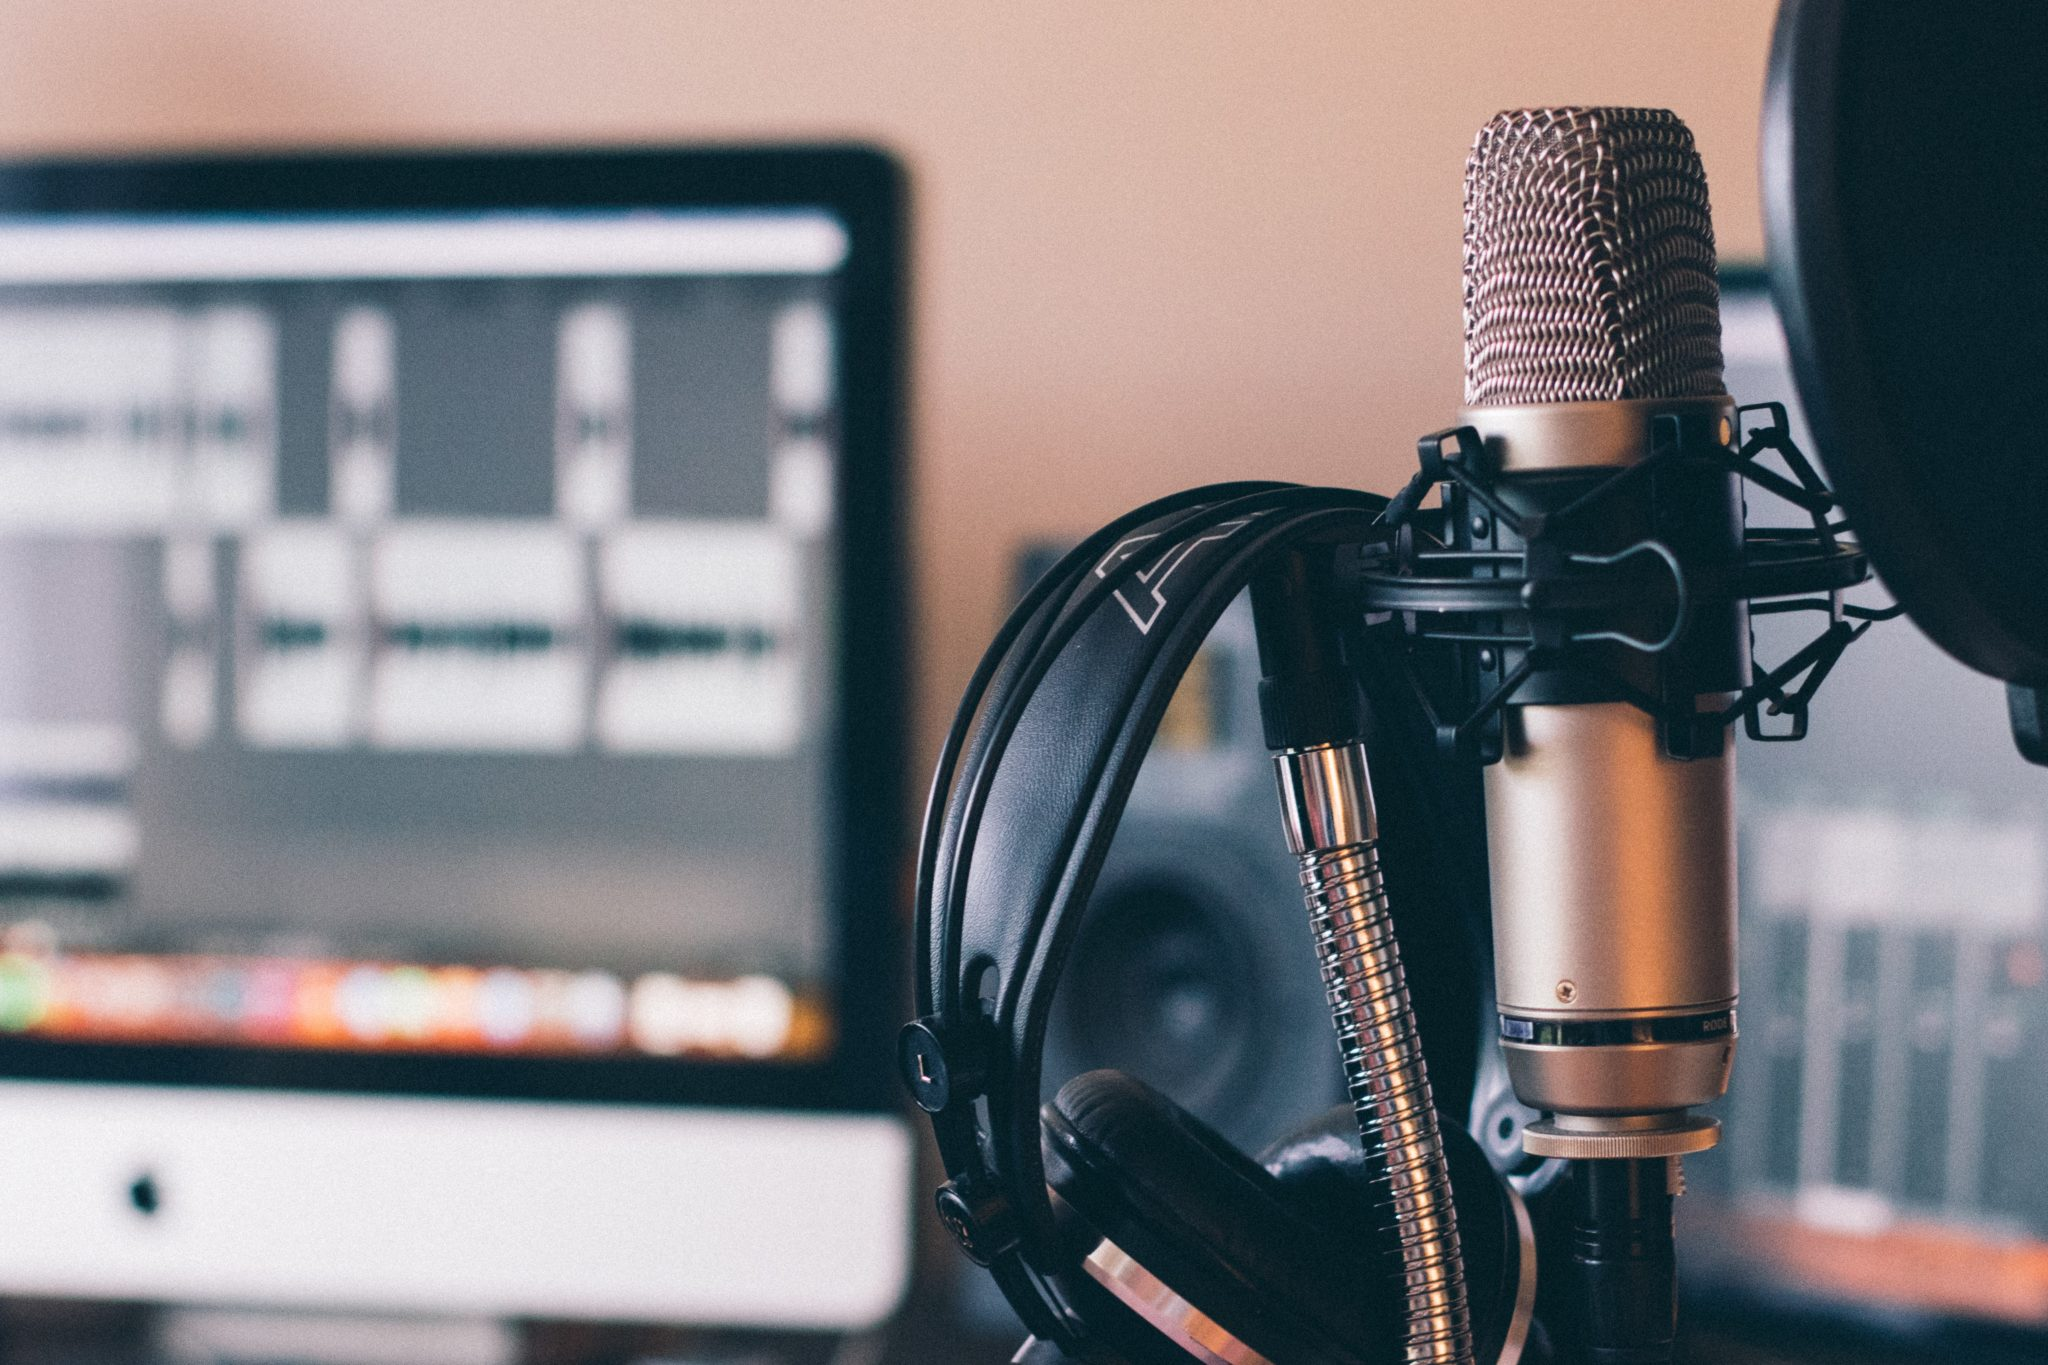 podcast voyage chili écouter expatriation au chili